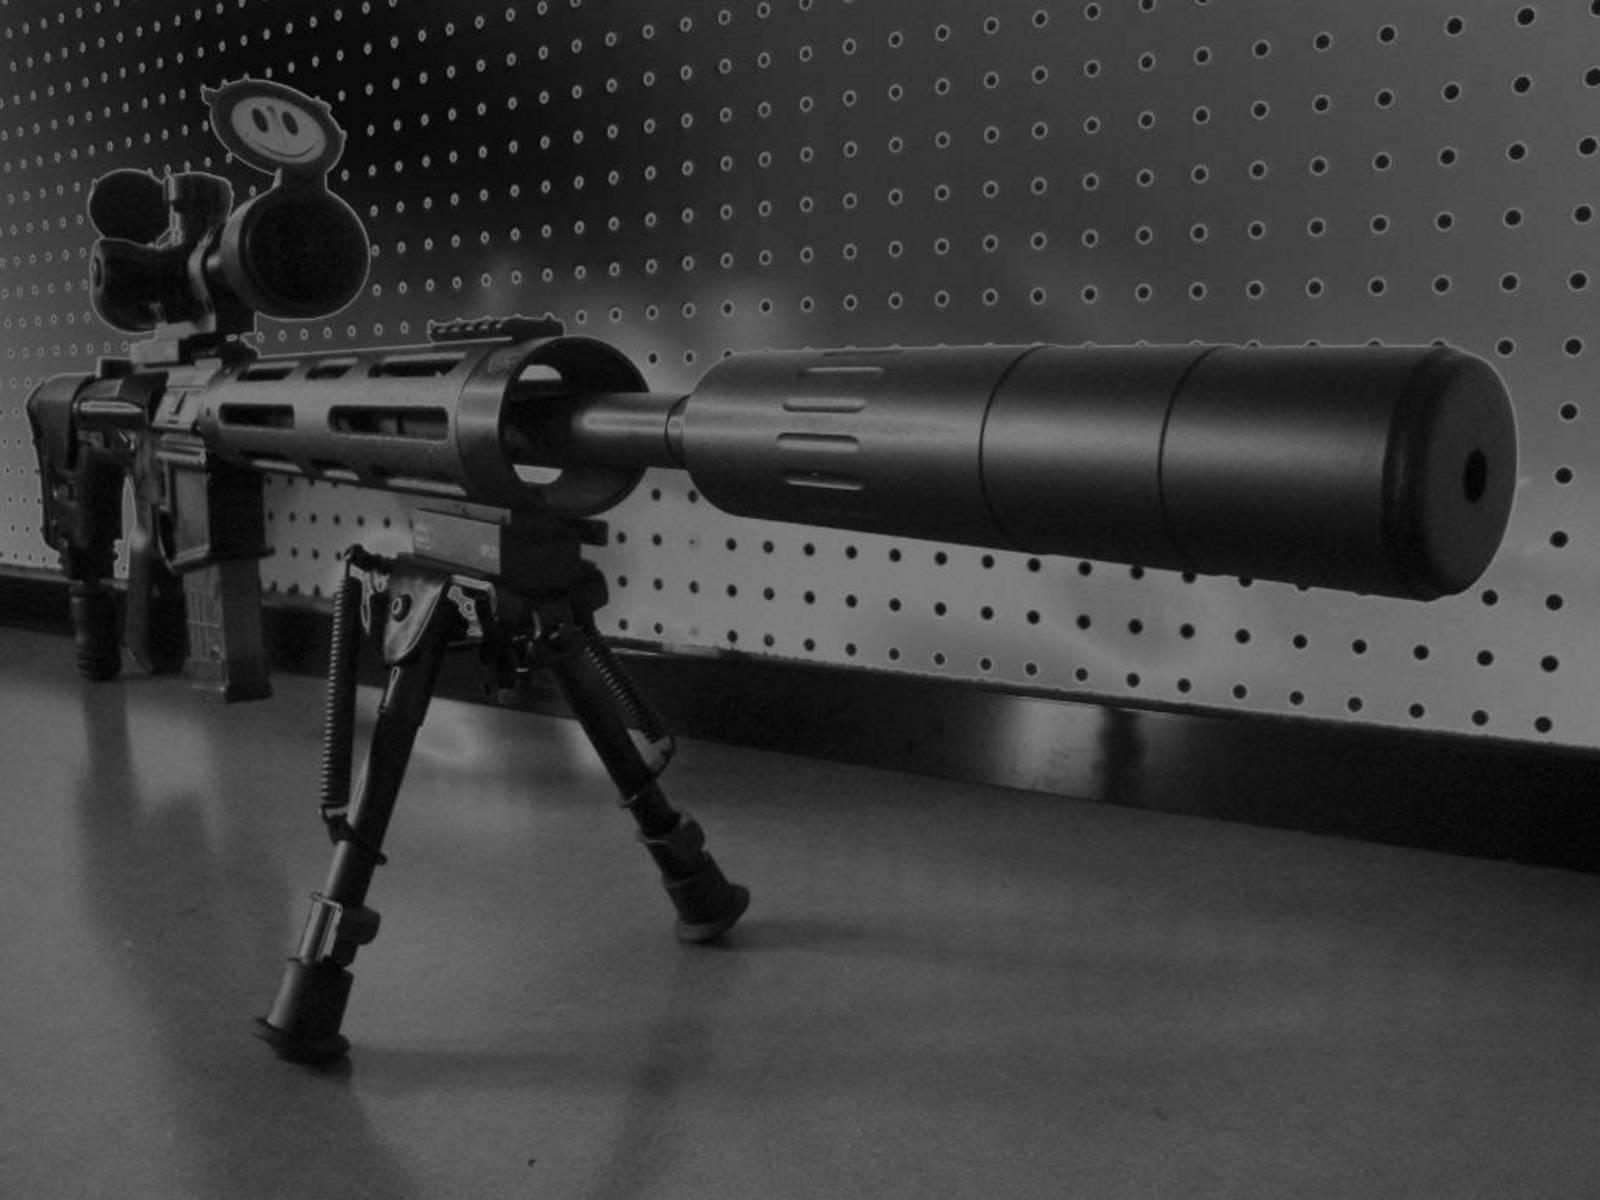 Sniper Rifles 16002151200 Wallpaper 619489 1600x1200